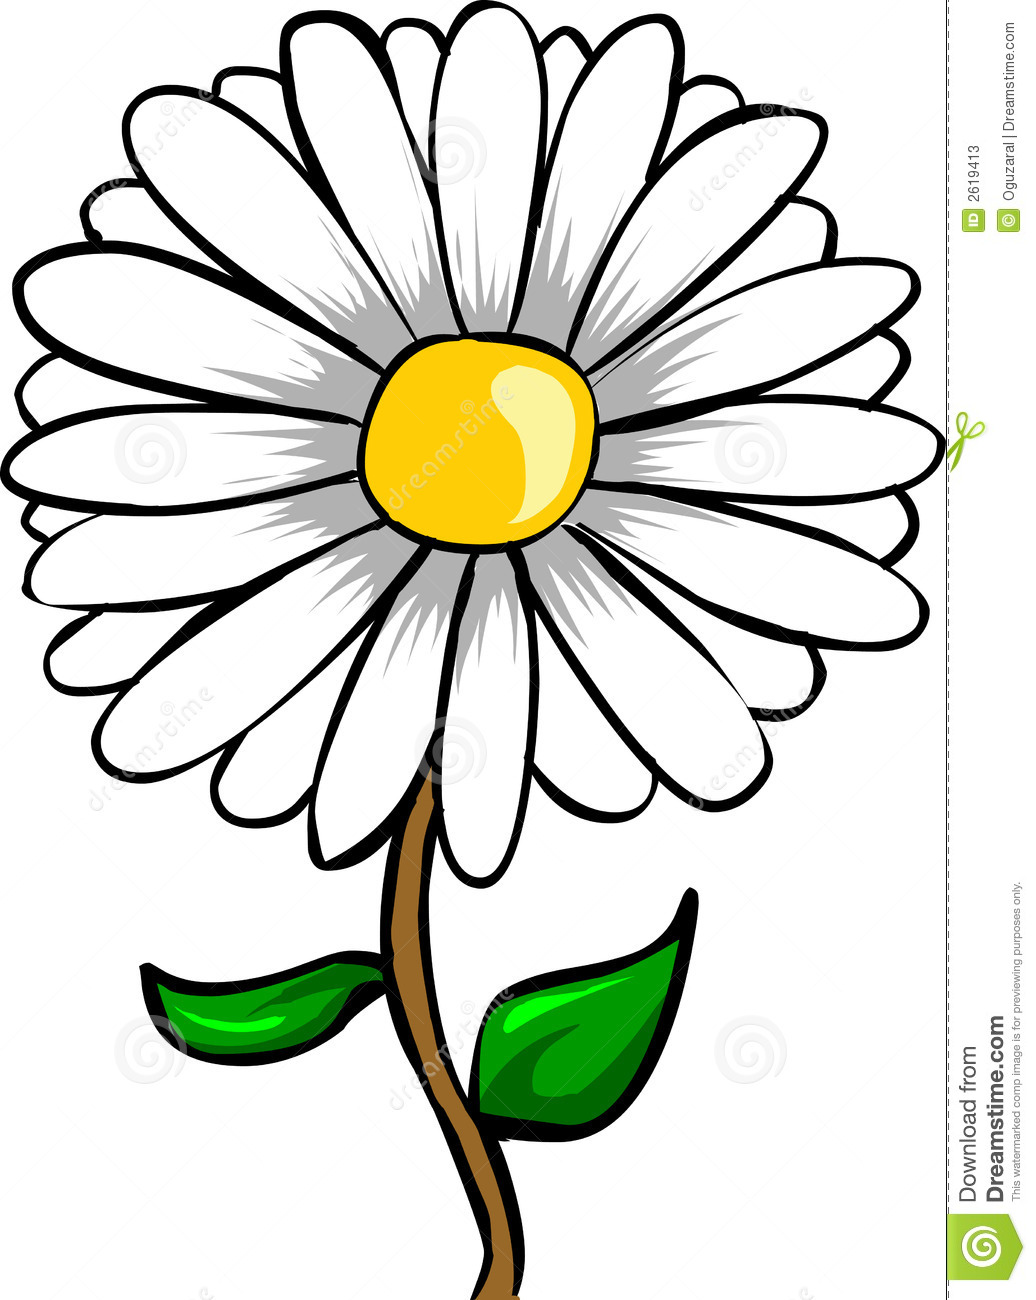 1036x1300 Splendid Ideas Daisy Clipart Top 71 Clip Art Free Image